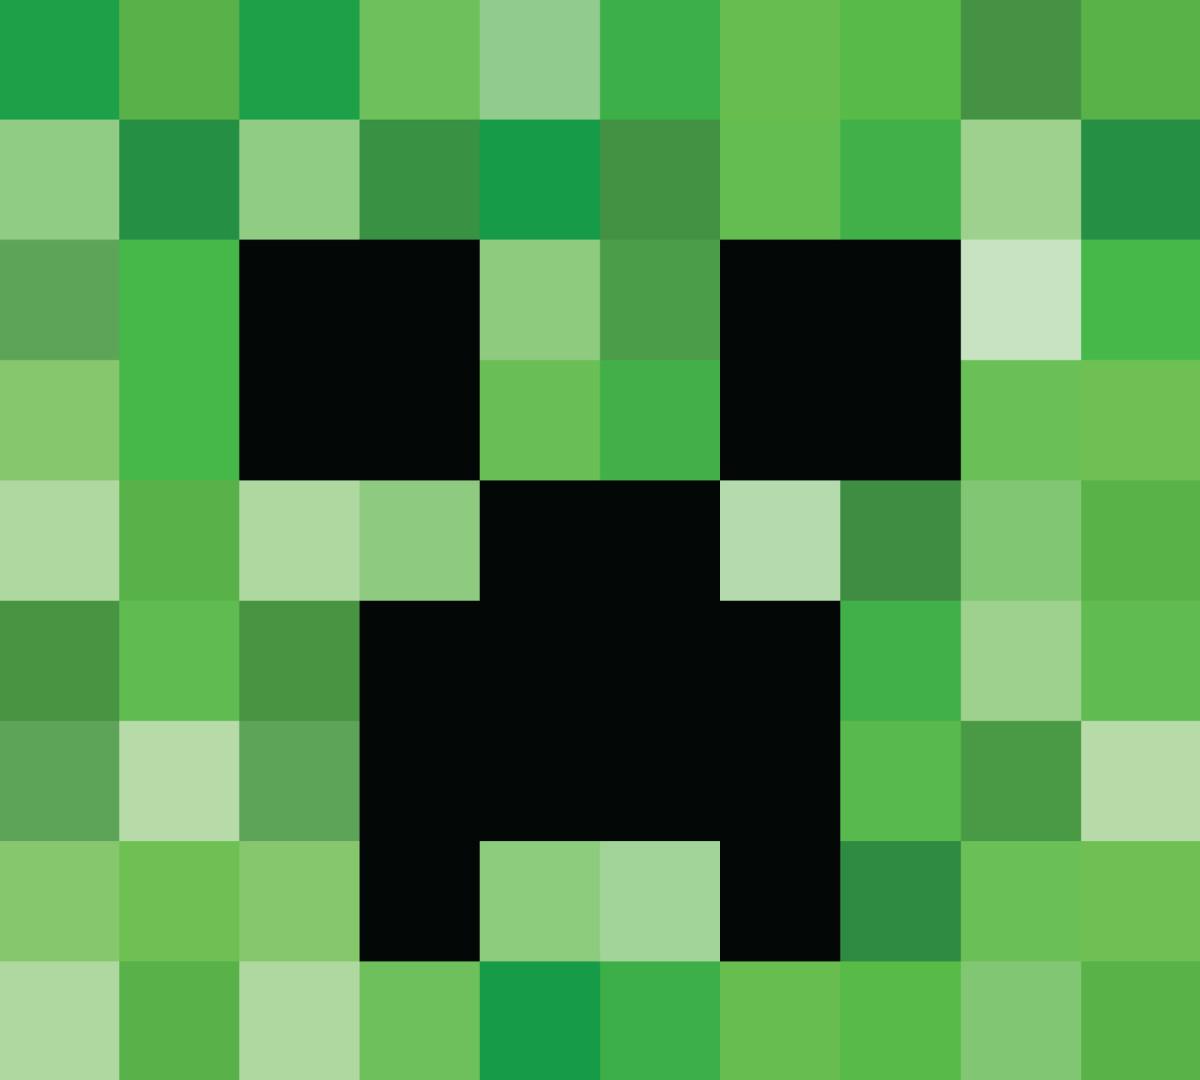 Free Minecraft Creeper Face Image